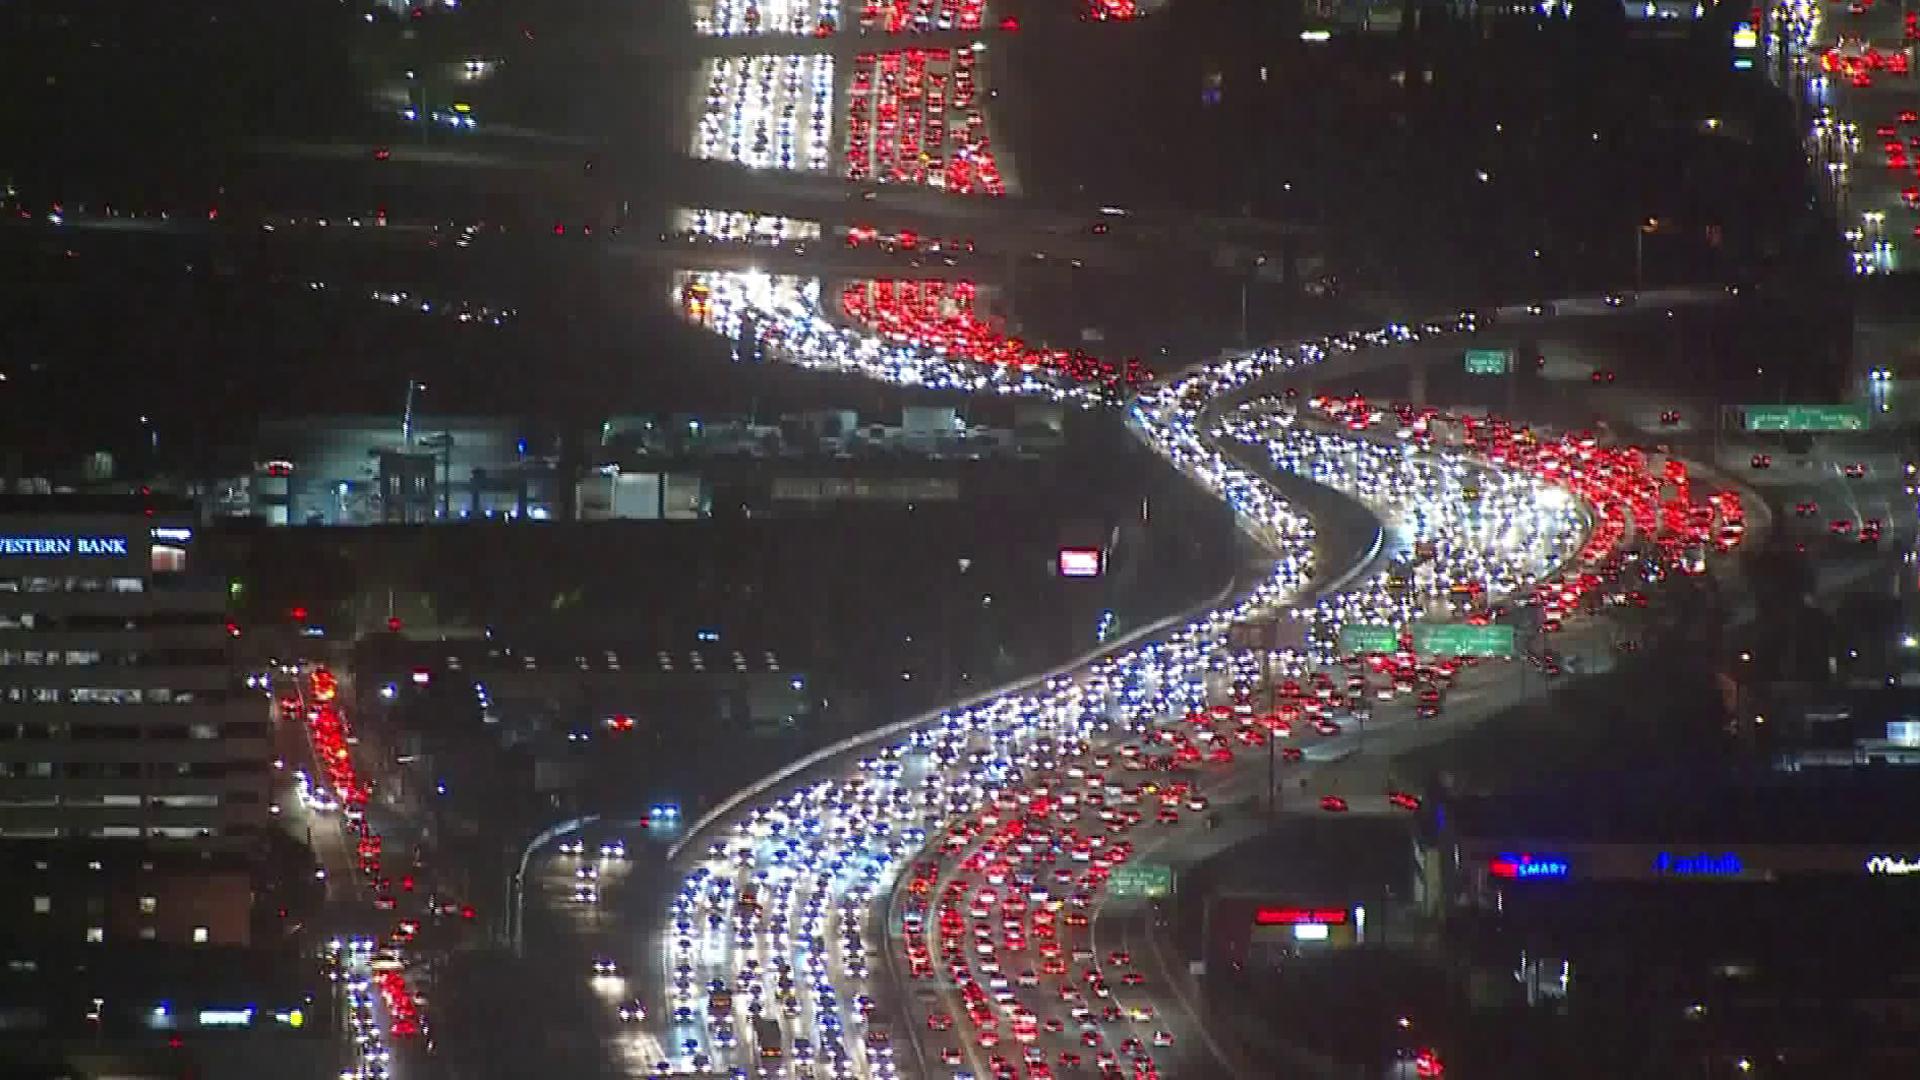 Traffic is gridlocked on the 405 Freeway at the 10 Freeway on L.A.'s Westside on Nov. 21, 2017. (Credit: KTLA)